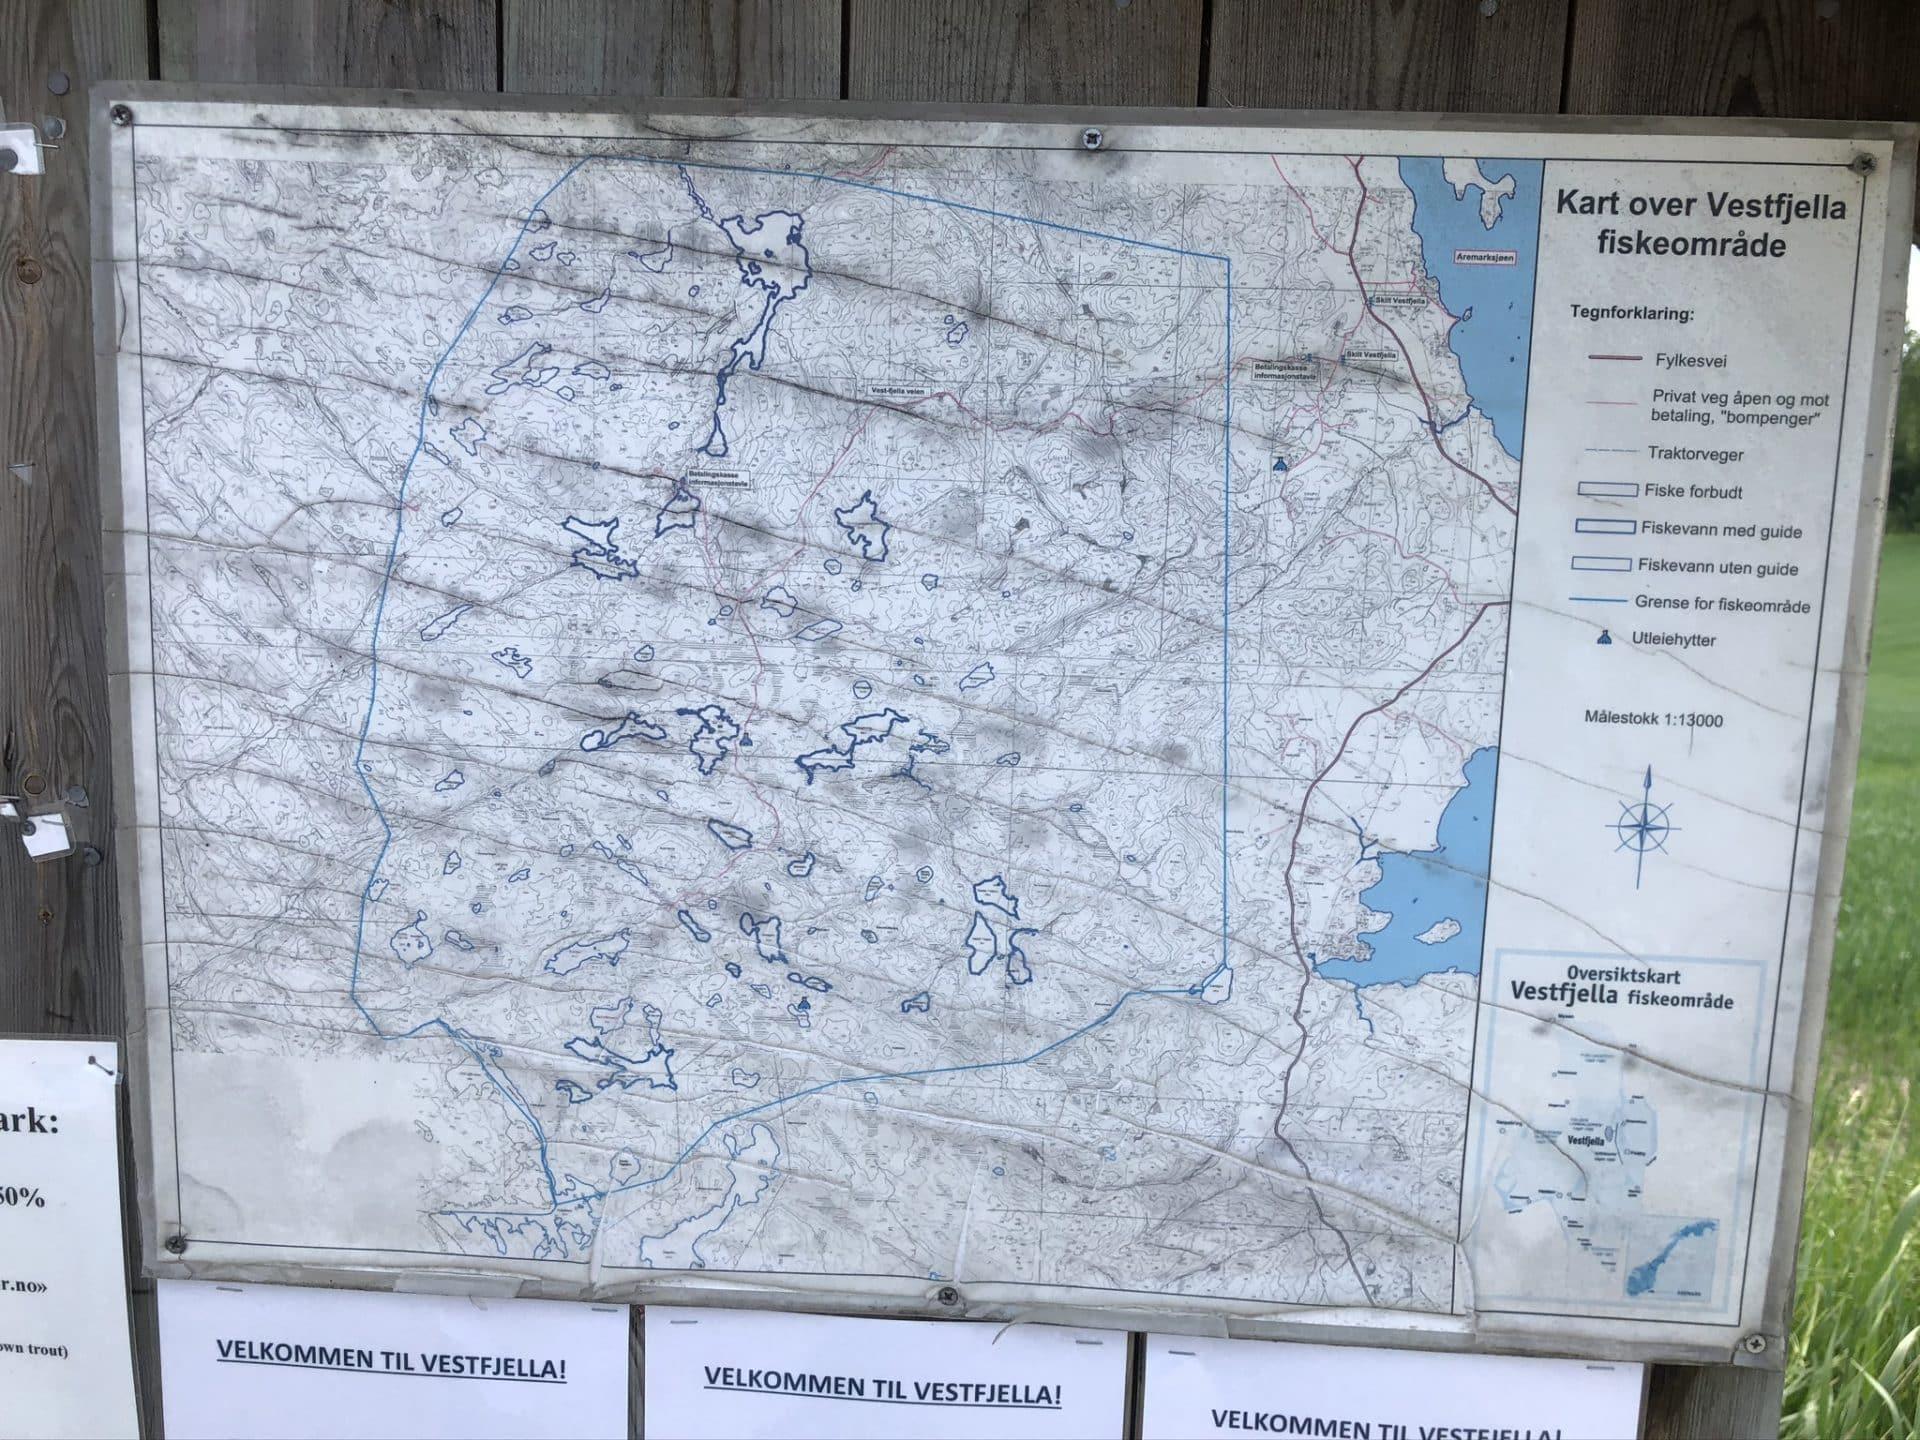 Vestfjella fiskeområde, kart